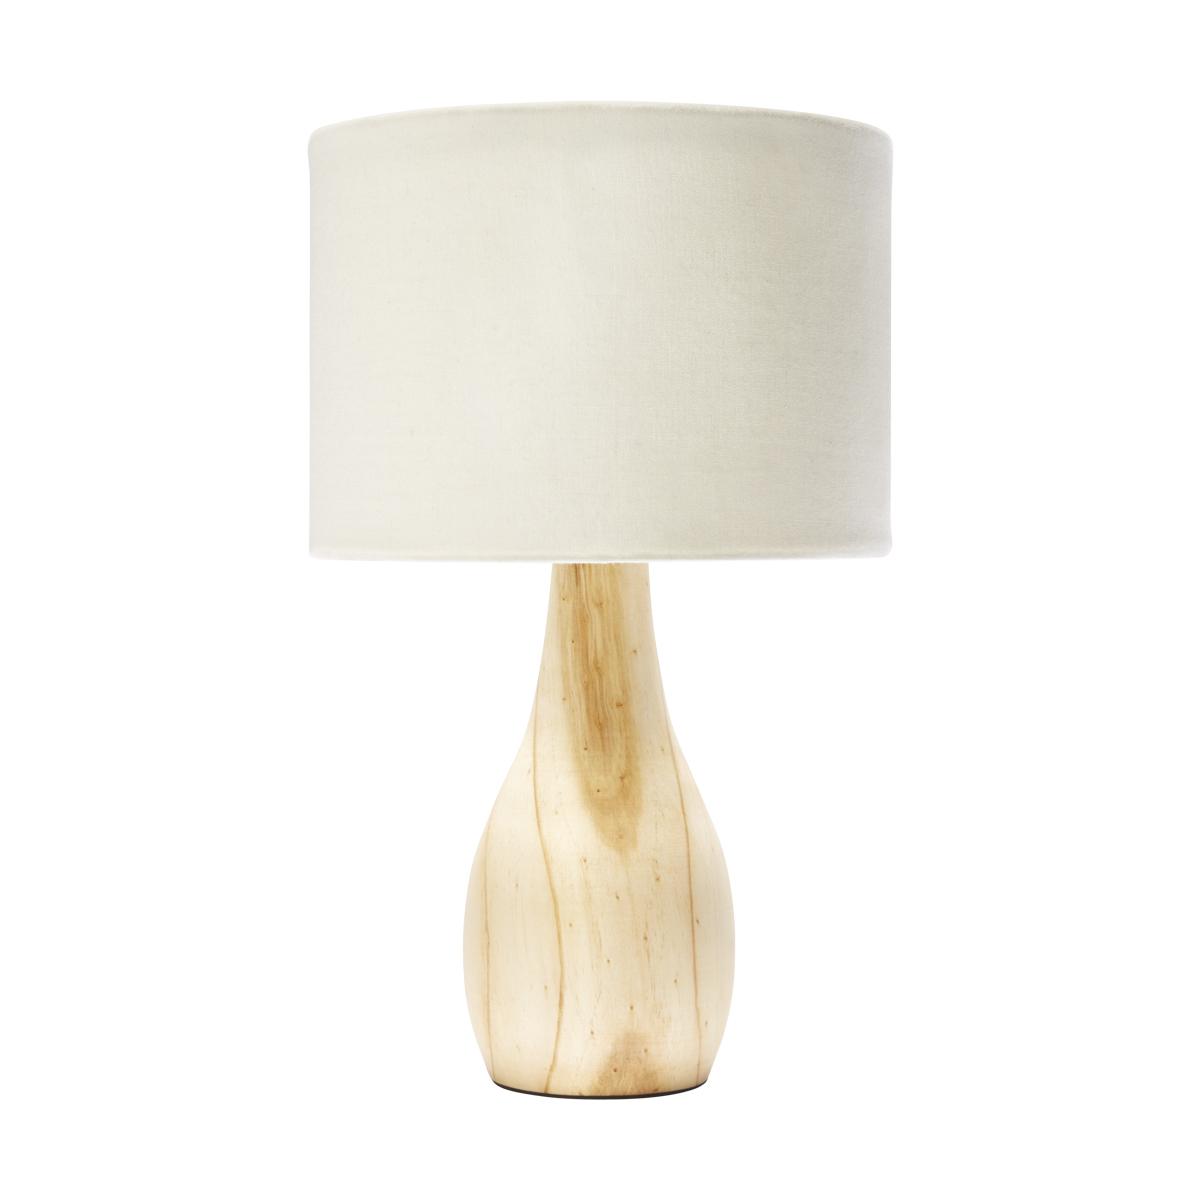 Wood Effect Base Lamp Kmart